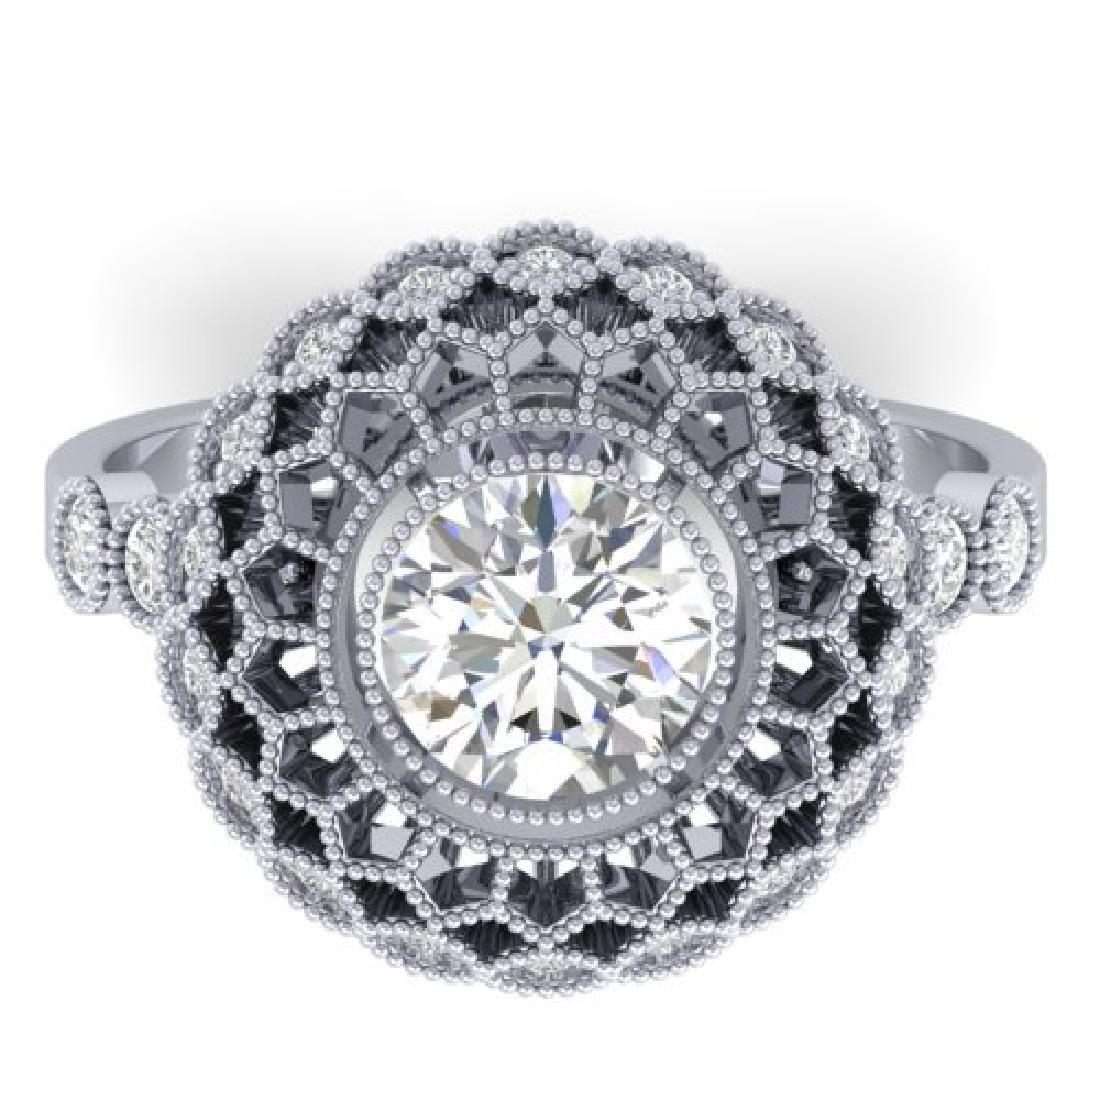 1.5 CTW Certified VS/SI Diamond Art Deco Ring 18K White